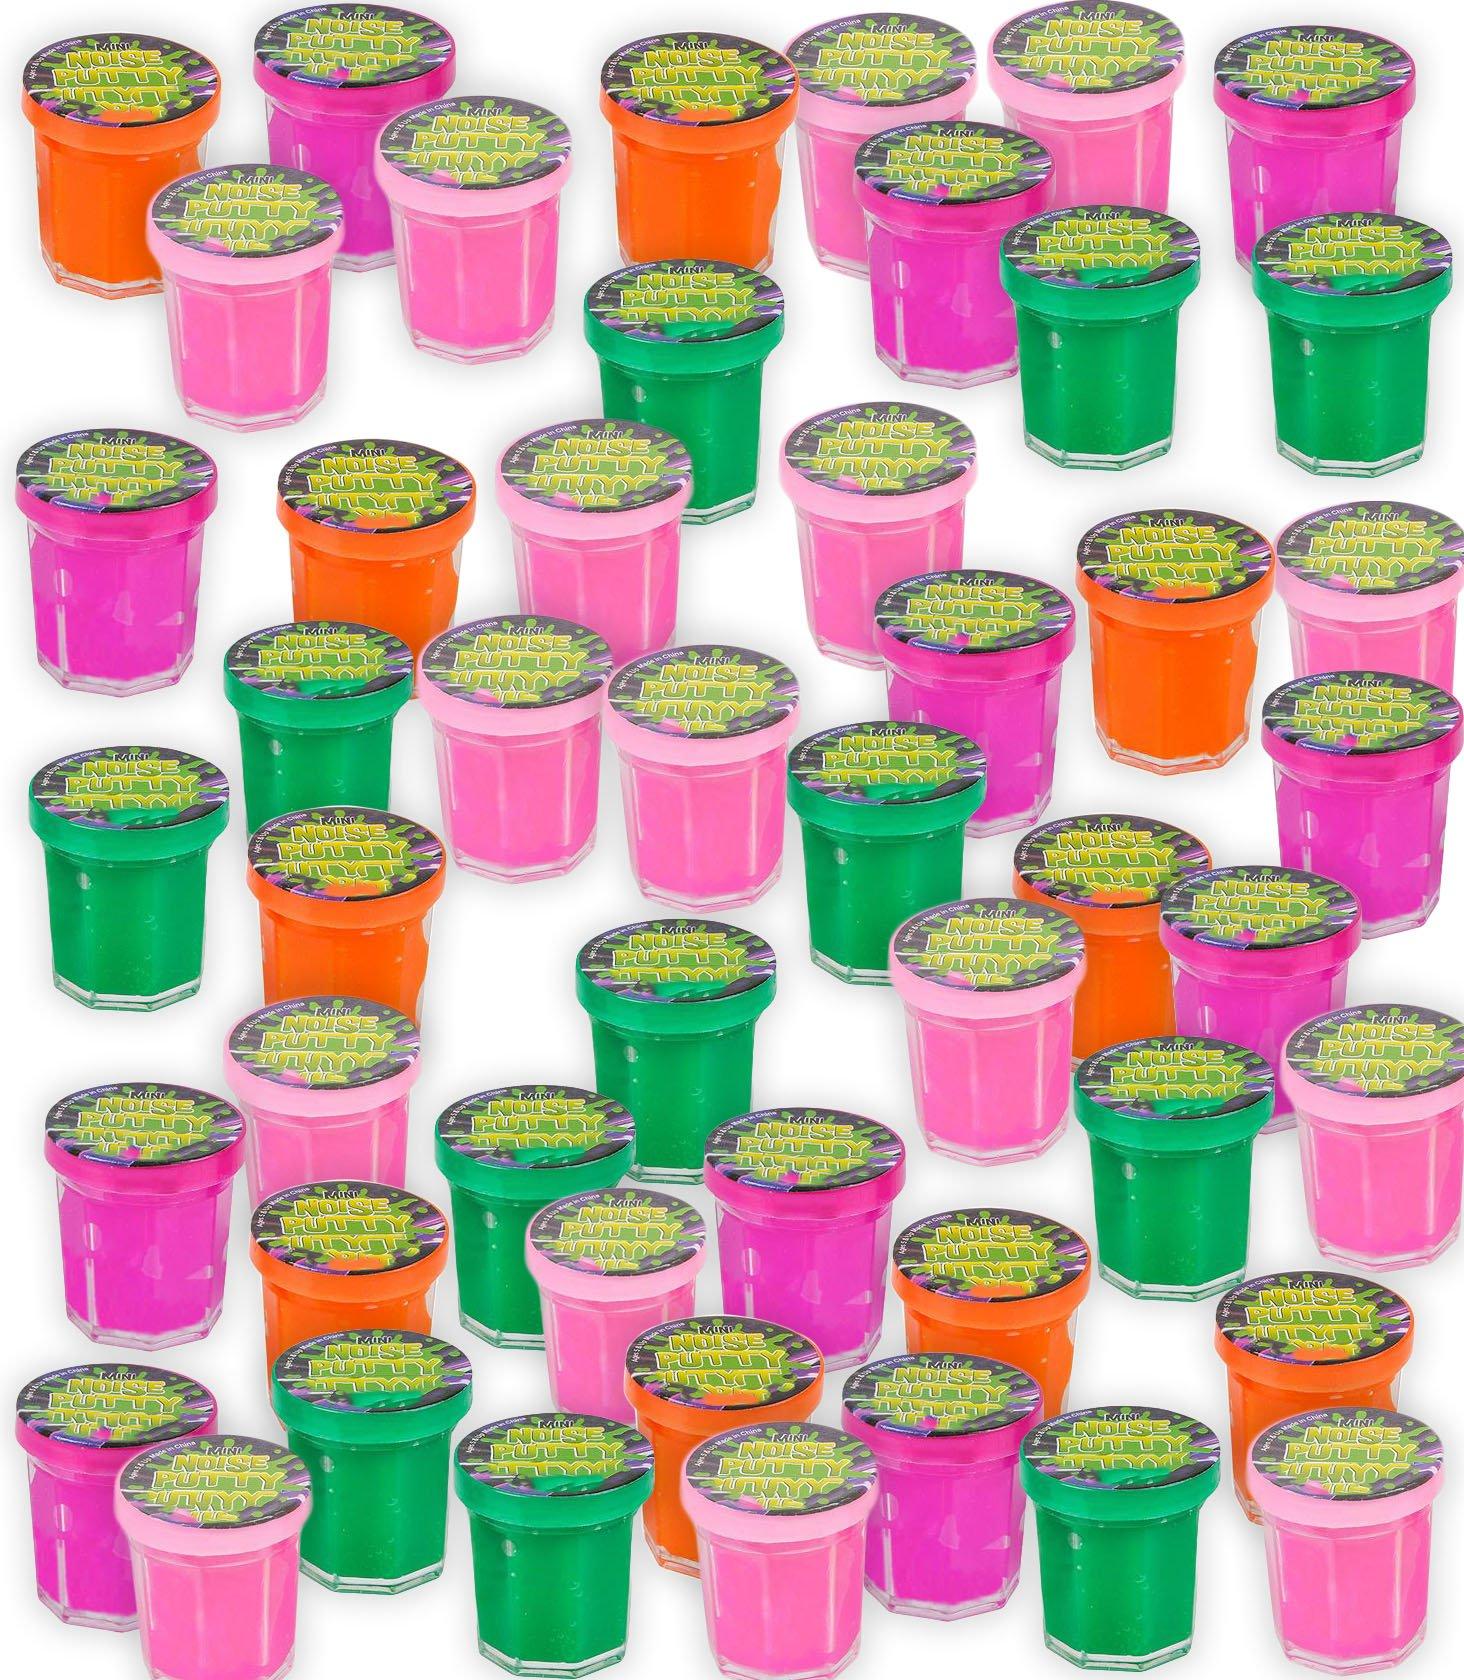 4E's Novelty 48 Pack Mini Noise Putty Slime Bulk Assortment, Great Birthday Party Favors Supplies, for Kids Boys Girls, 1.25'' Great Gag Gift